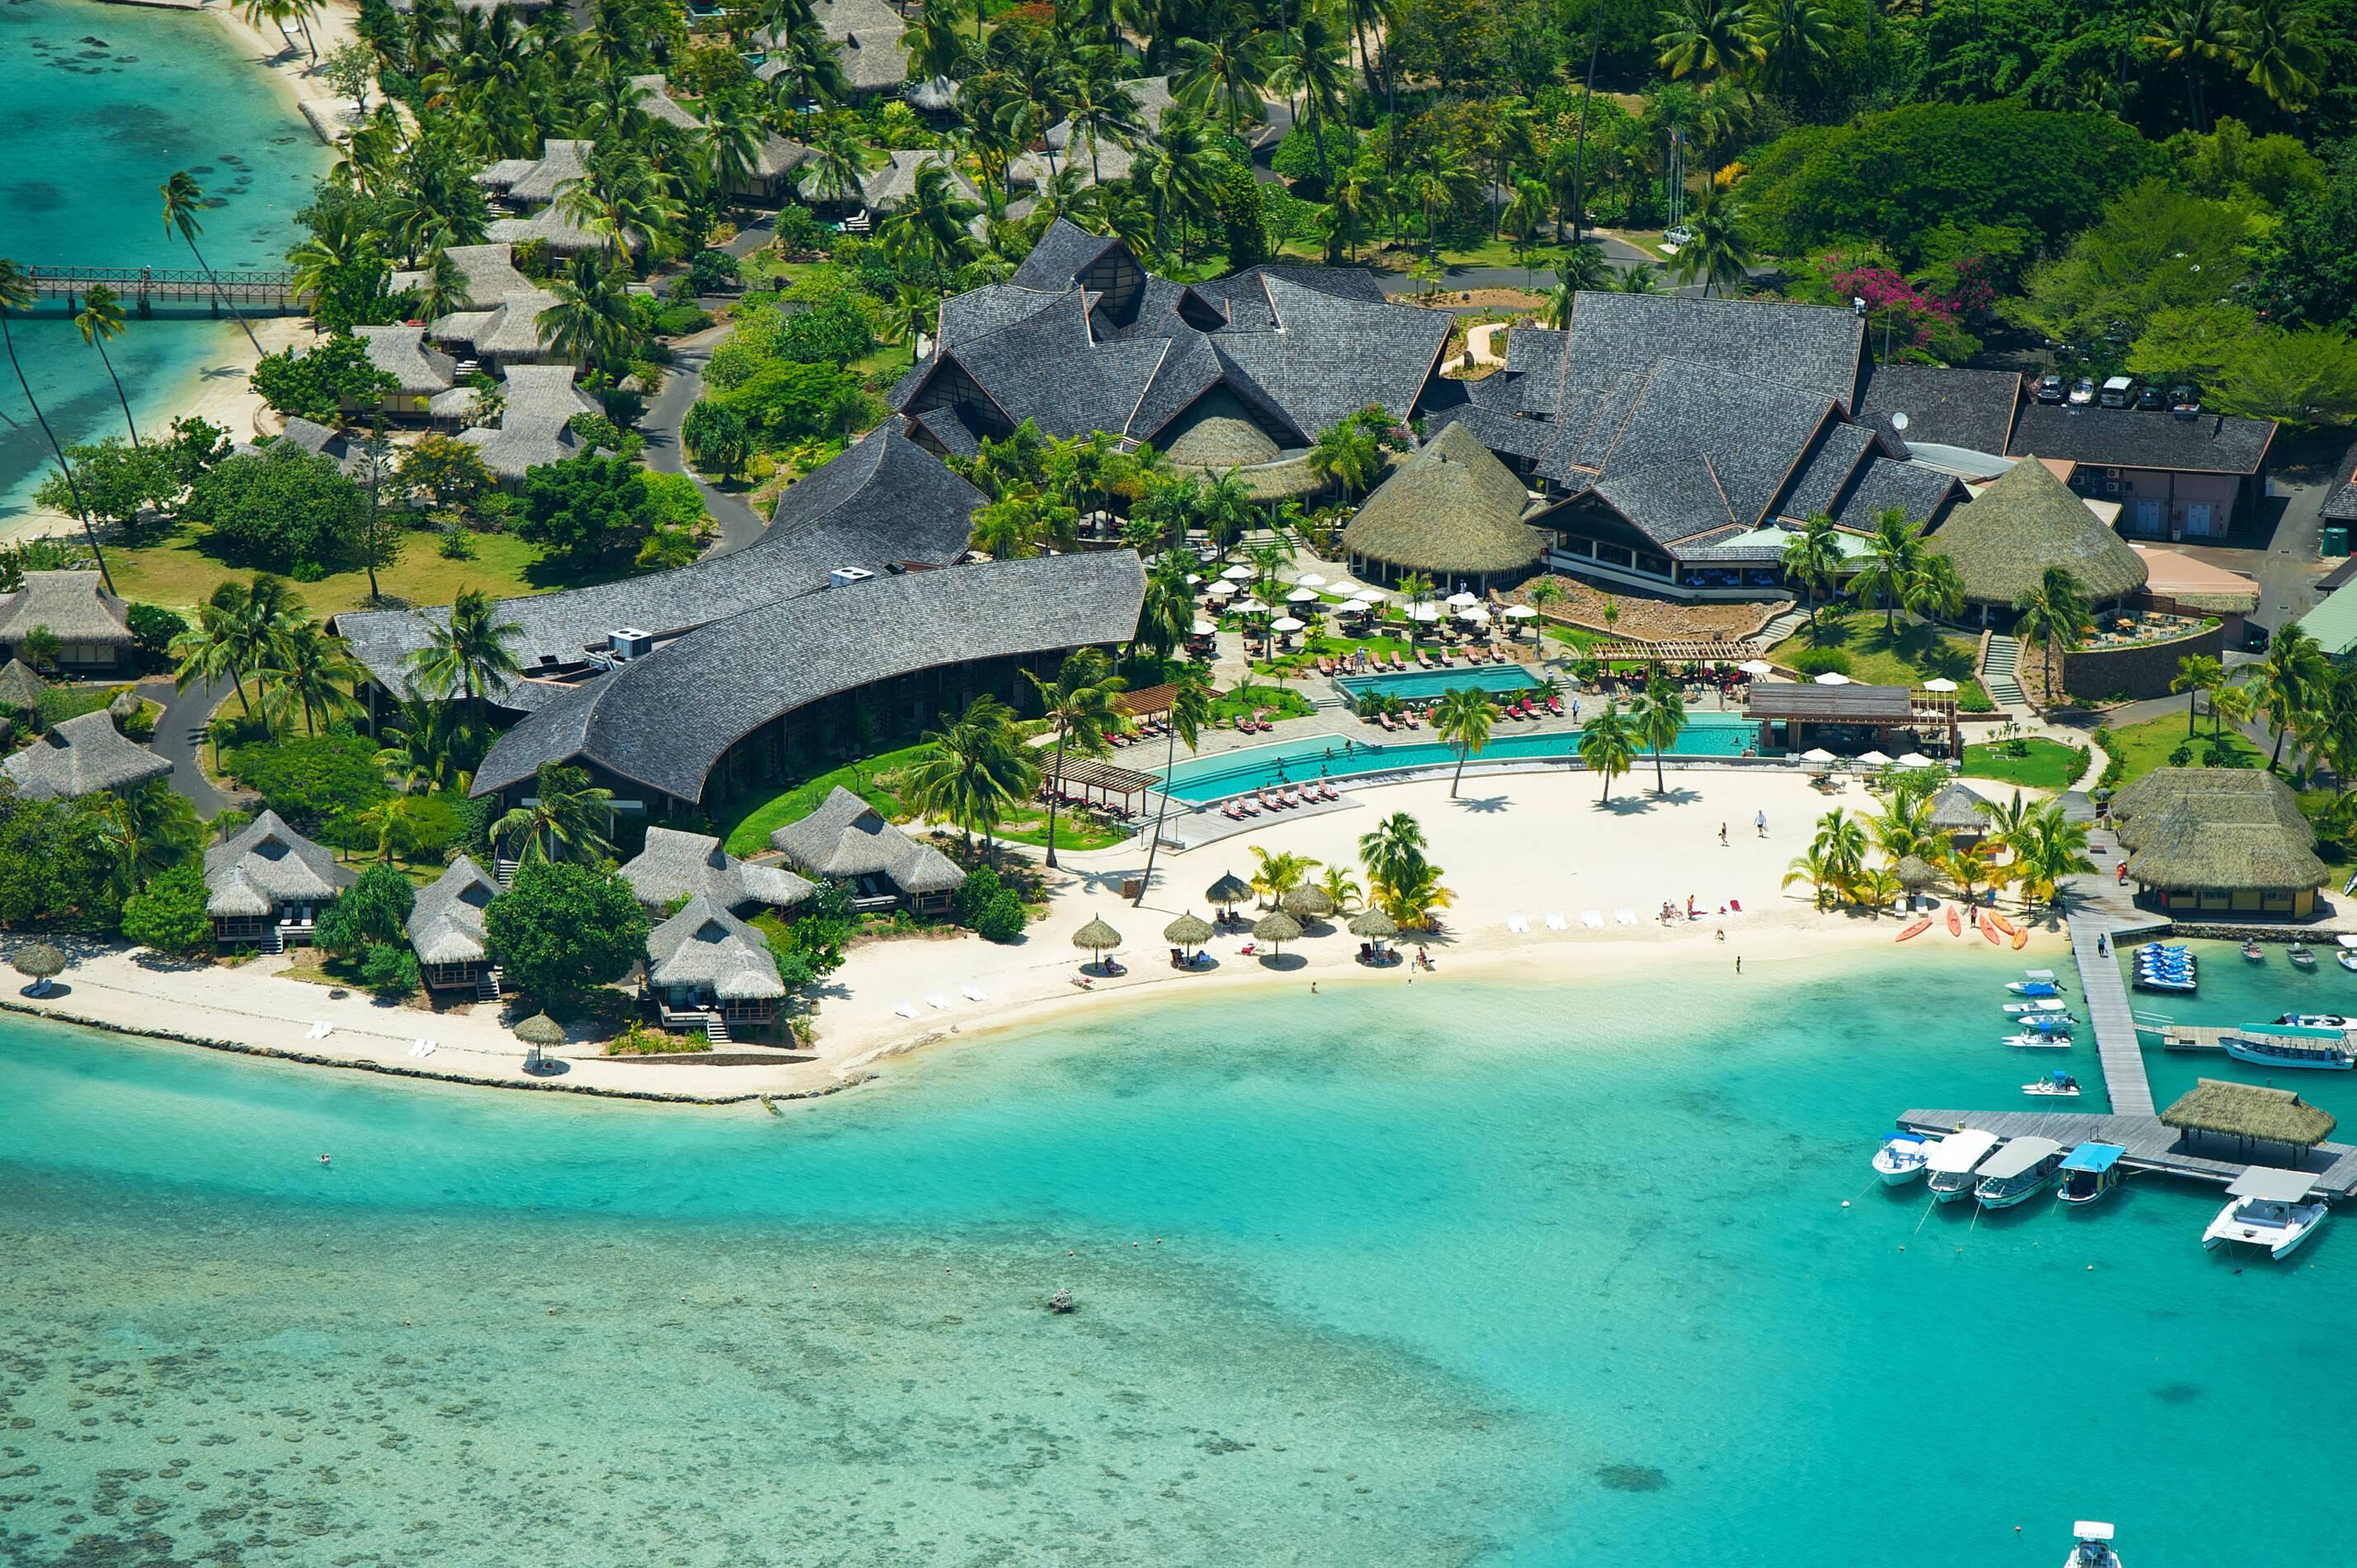 Moorea Intercontinental Polynesie Tim Mac Kenna